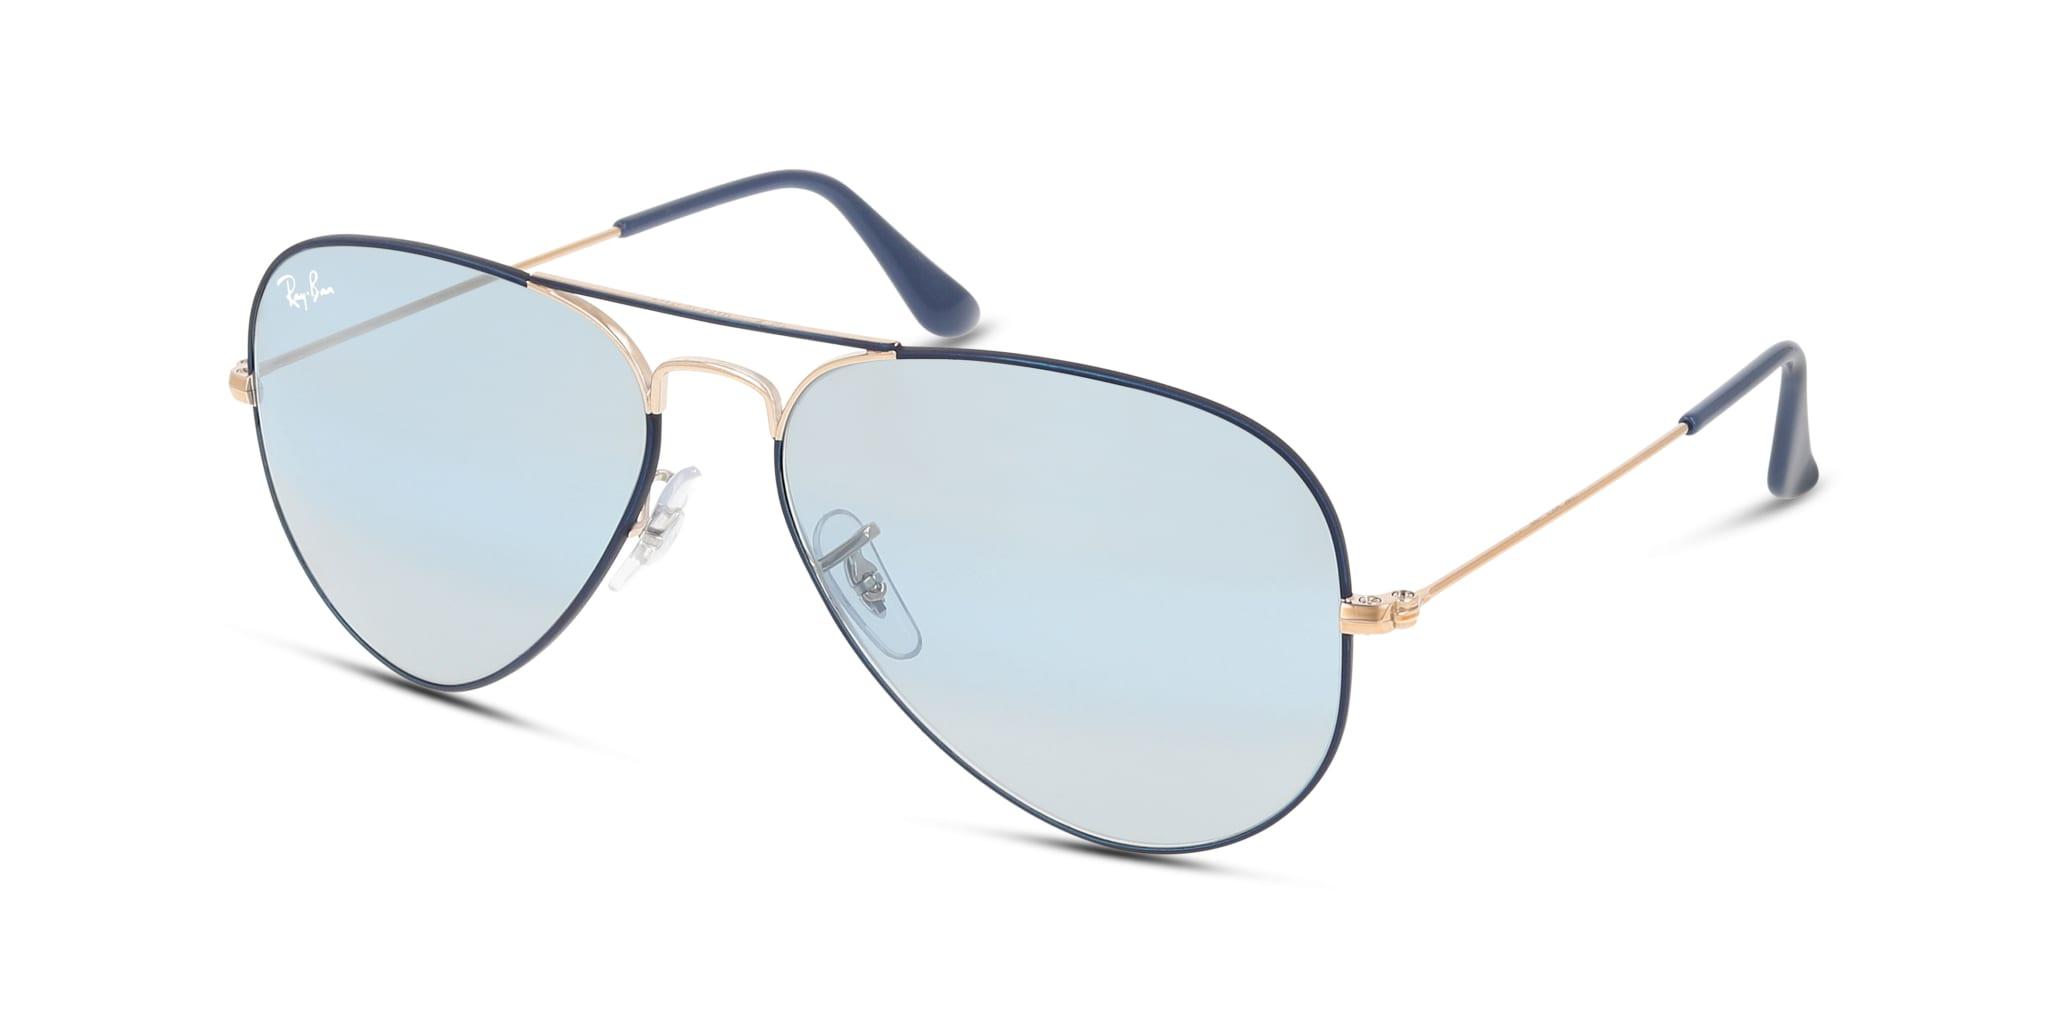 8056597044486-angle-03-ray-ban-0rb3025-eyewear-copper-on-matte-dark-blue